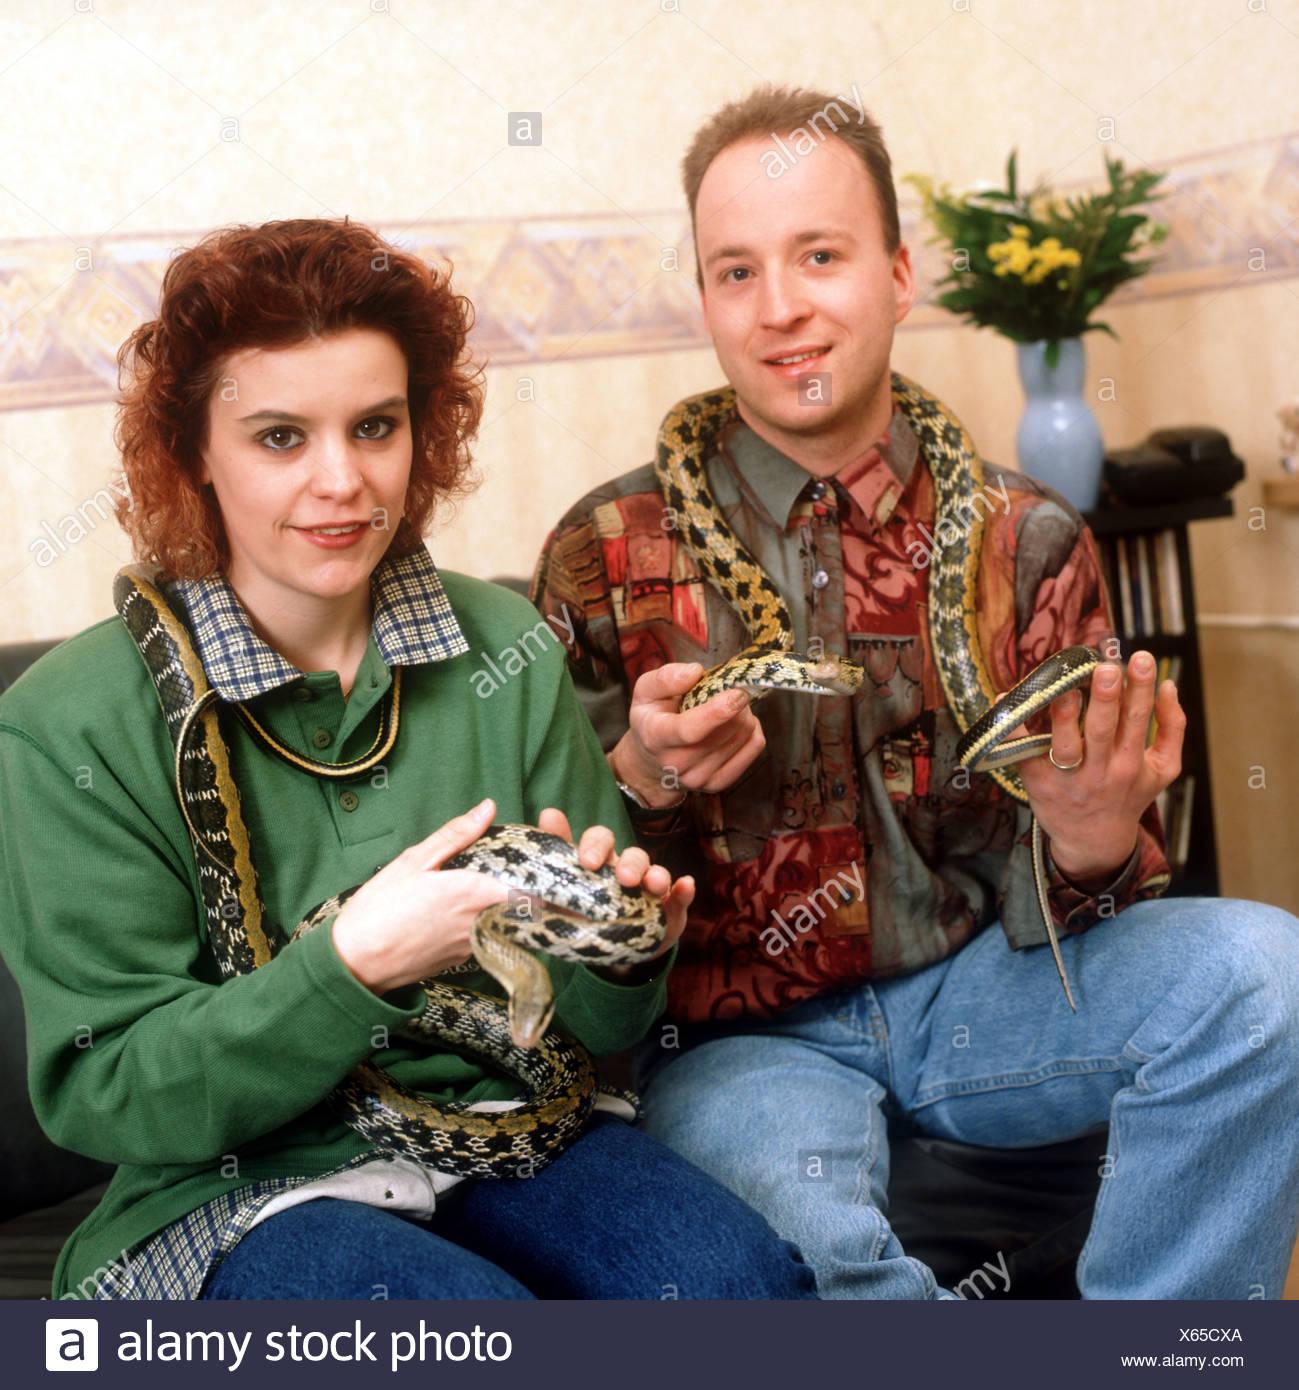 Couple with pet snakes on sofa  - SerieCVS500201b - Stock Image